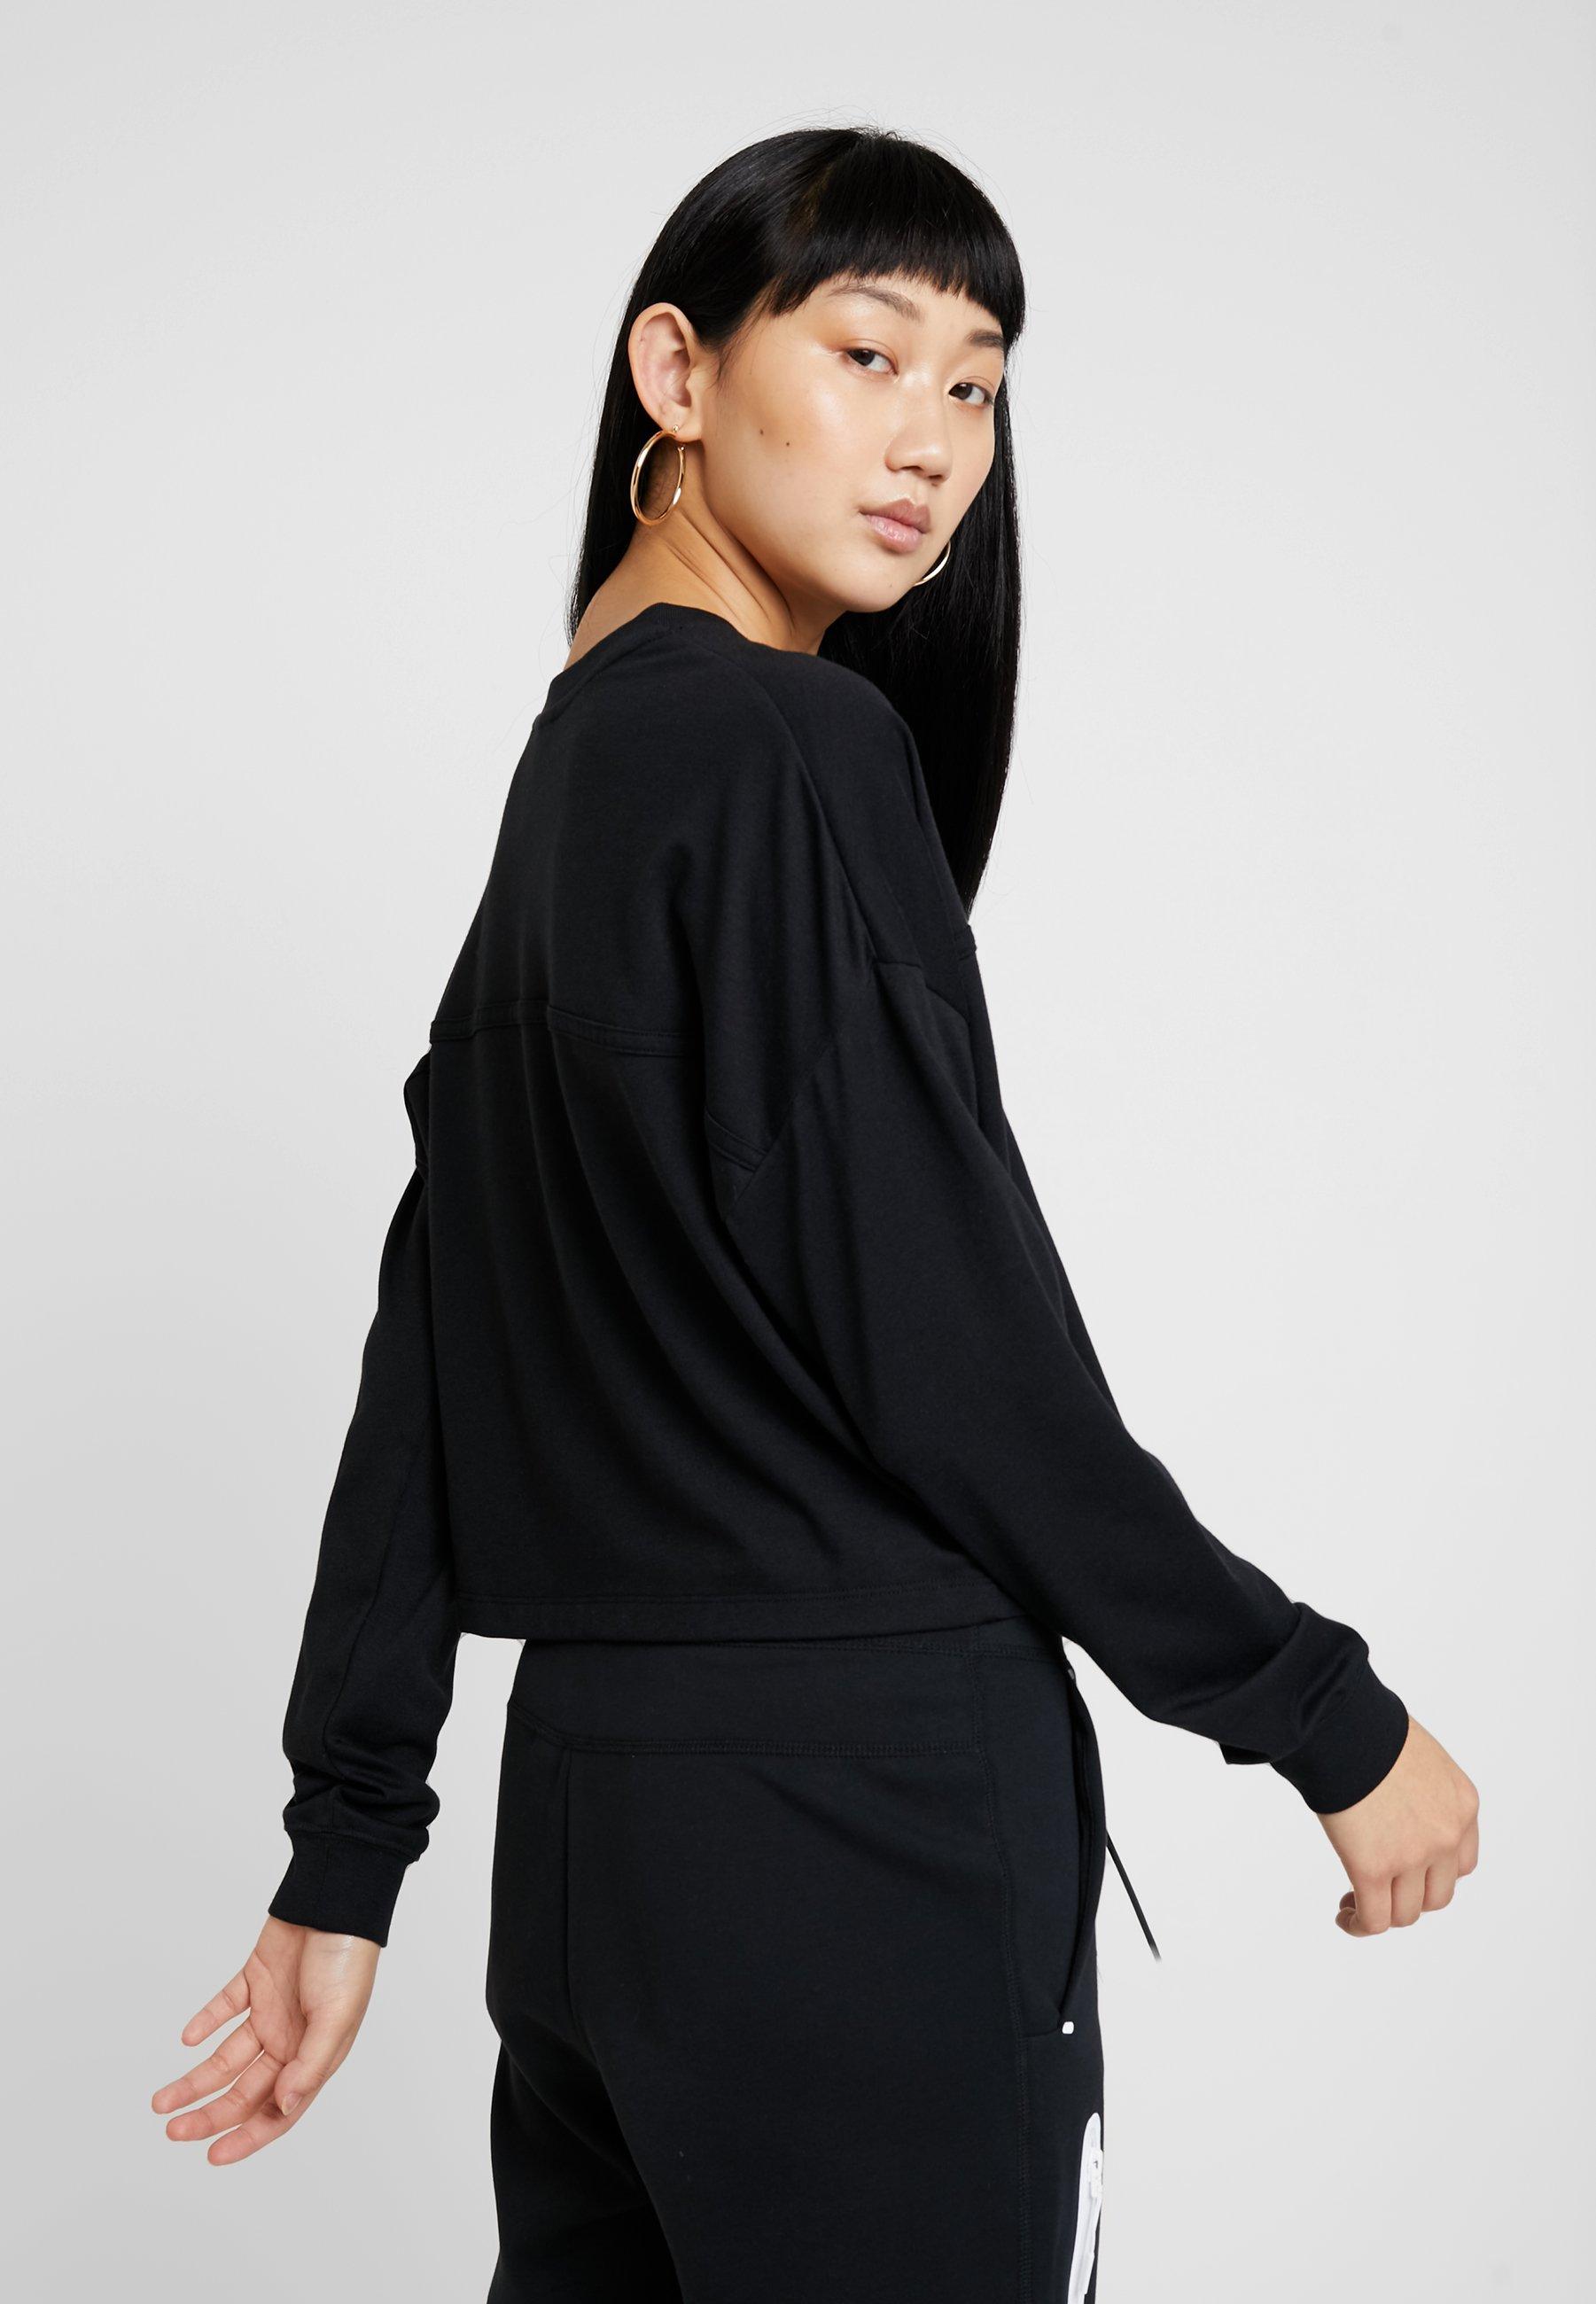 Sportswear white Nike Nike Sweatshirt black IYvbf6g7y